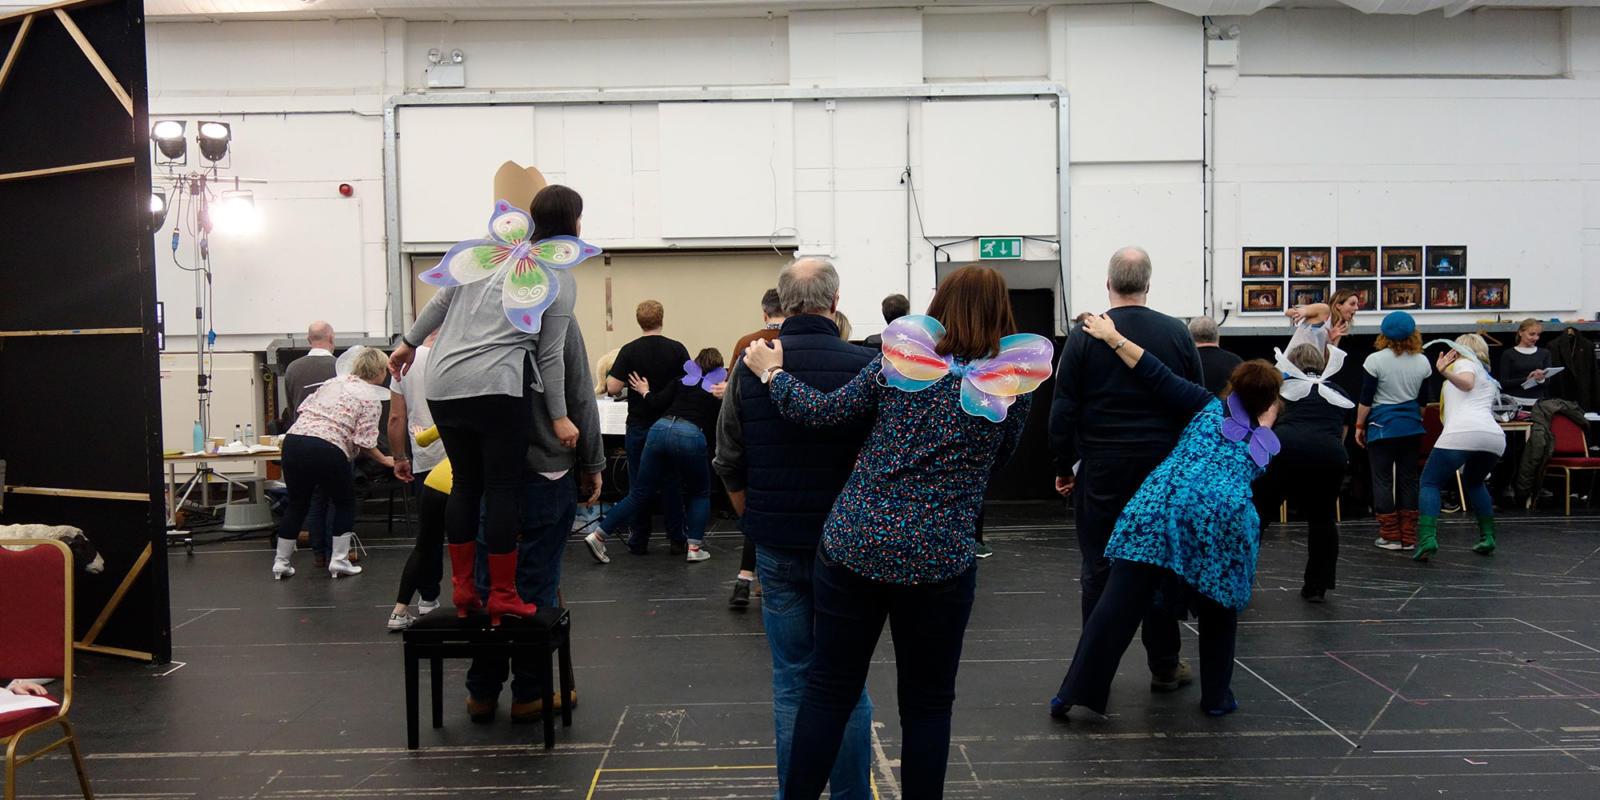 ENO Iolanthe: members of the ENO chorus dancing in pairs